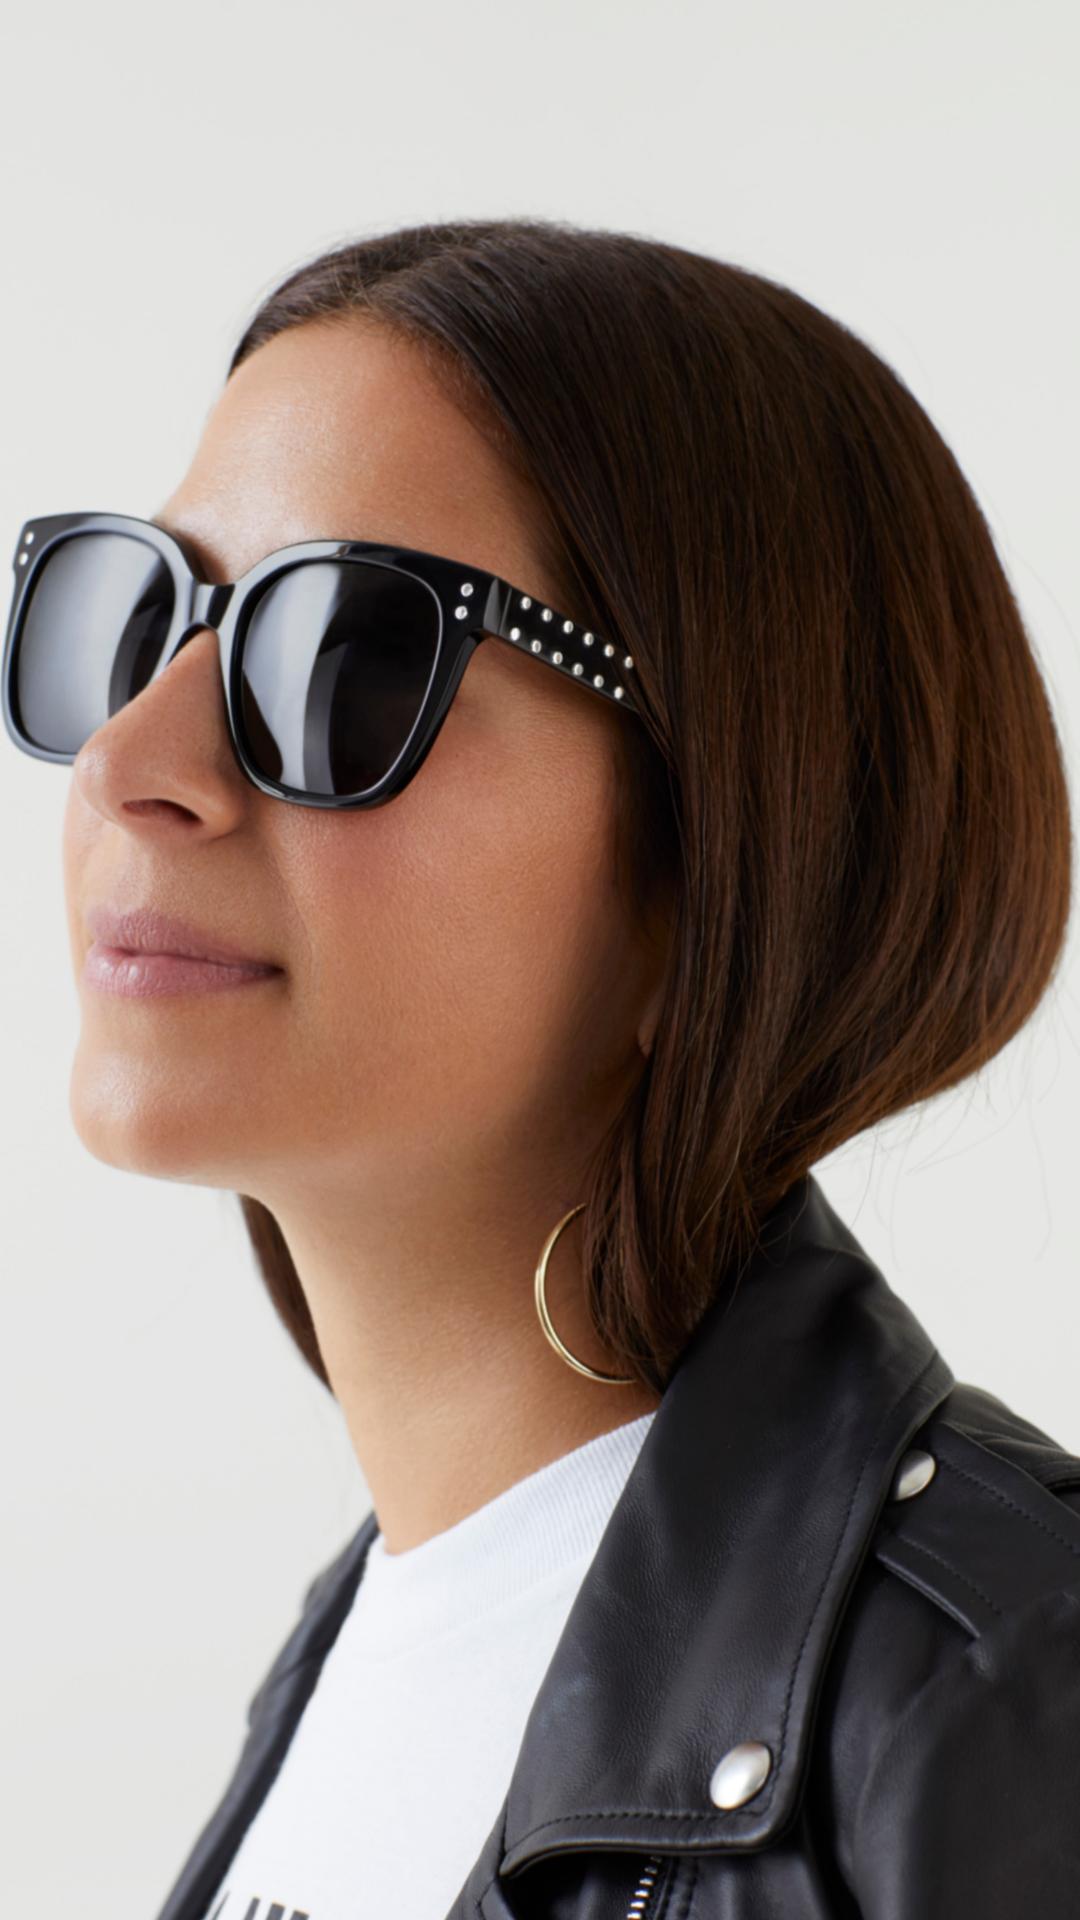 dde787295f Rebecca Minkoff wears the Cyndi Acetate Square Sunglasses from her  sunglasses collection.